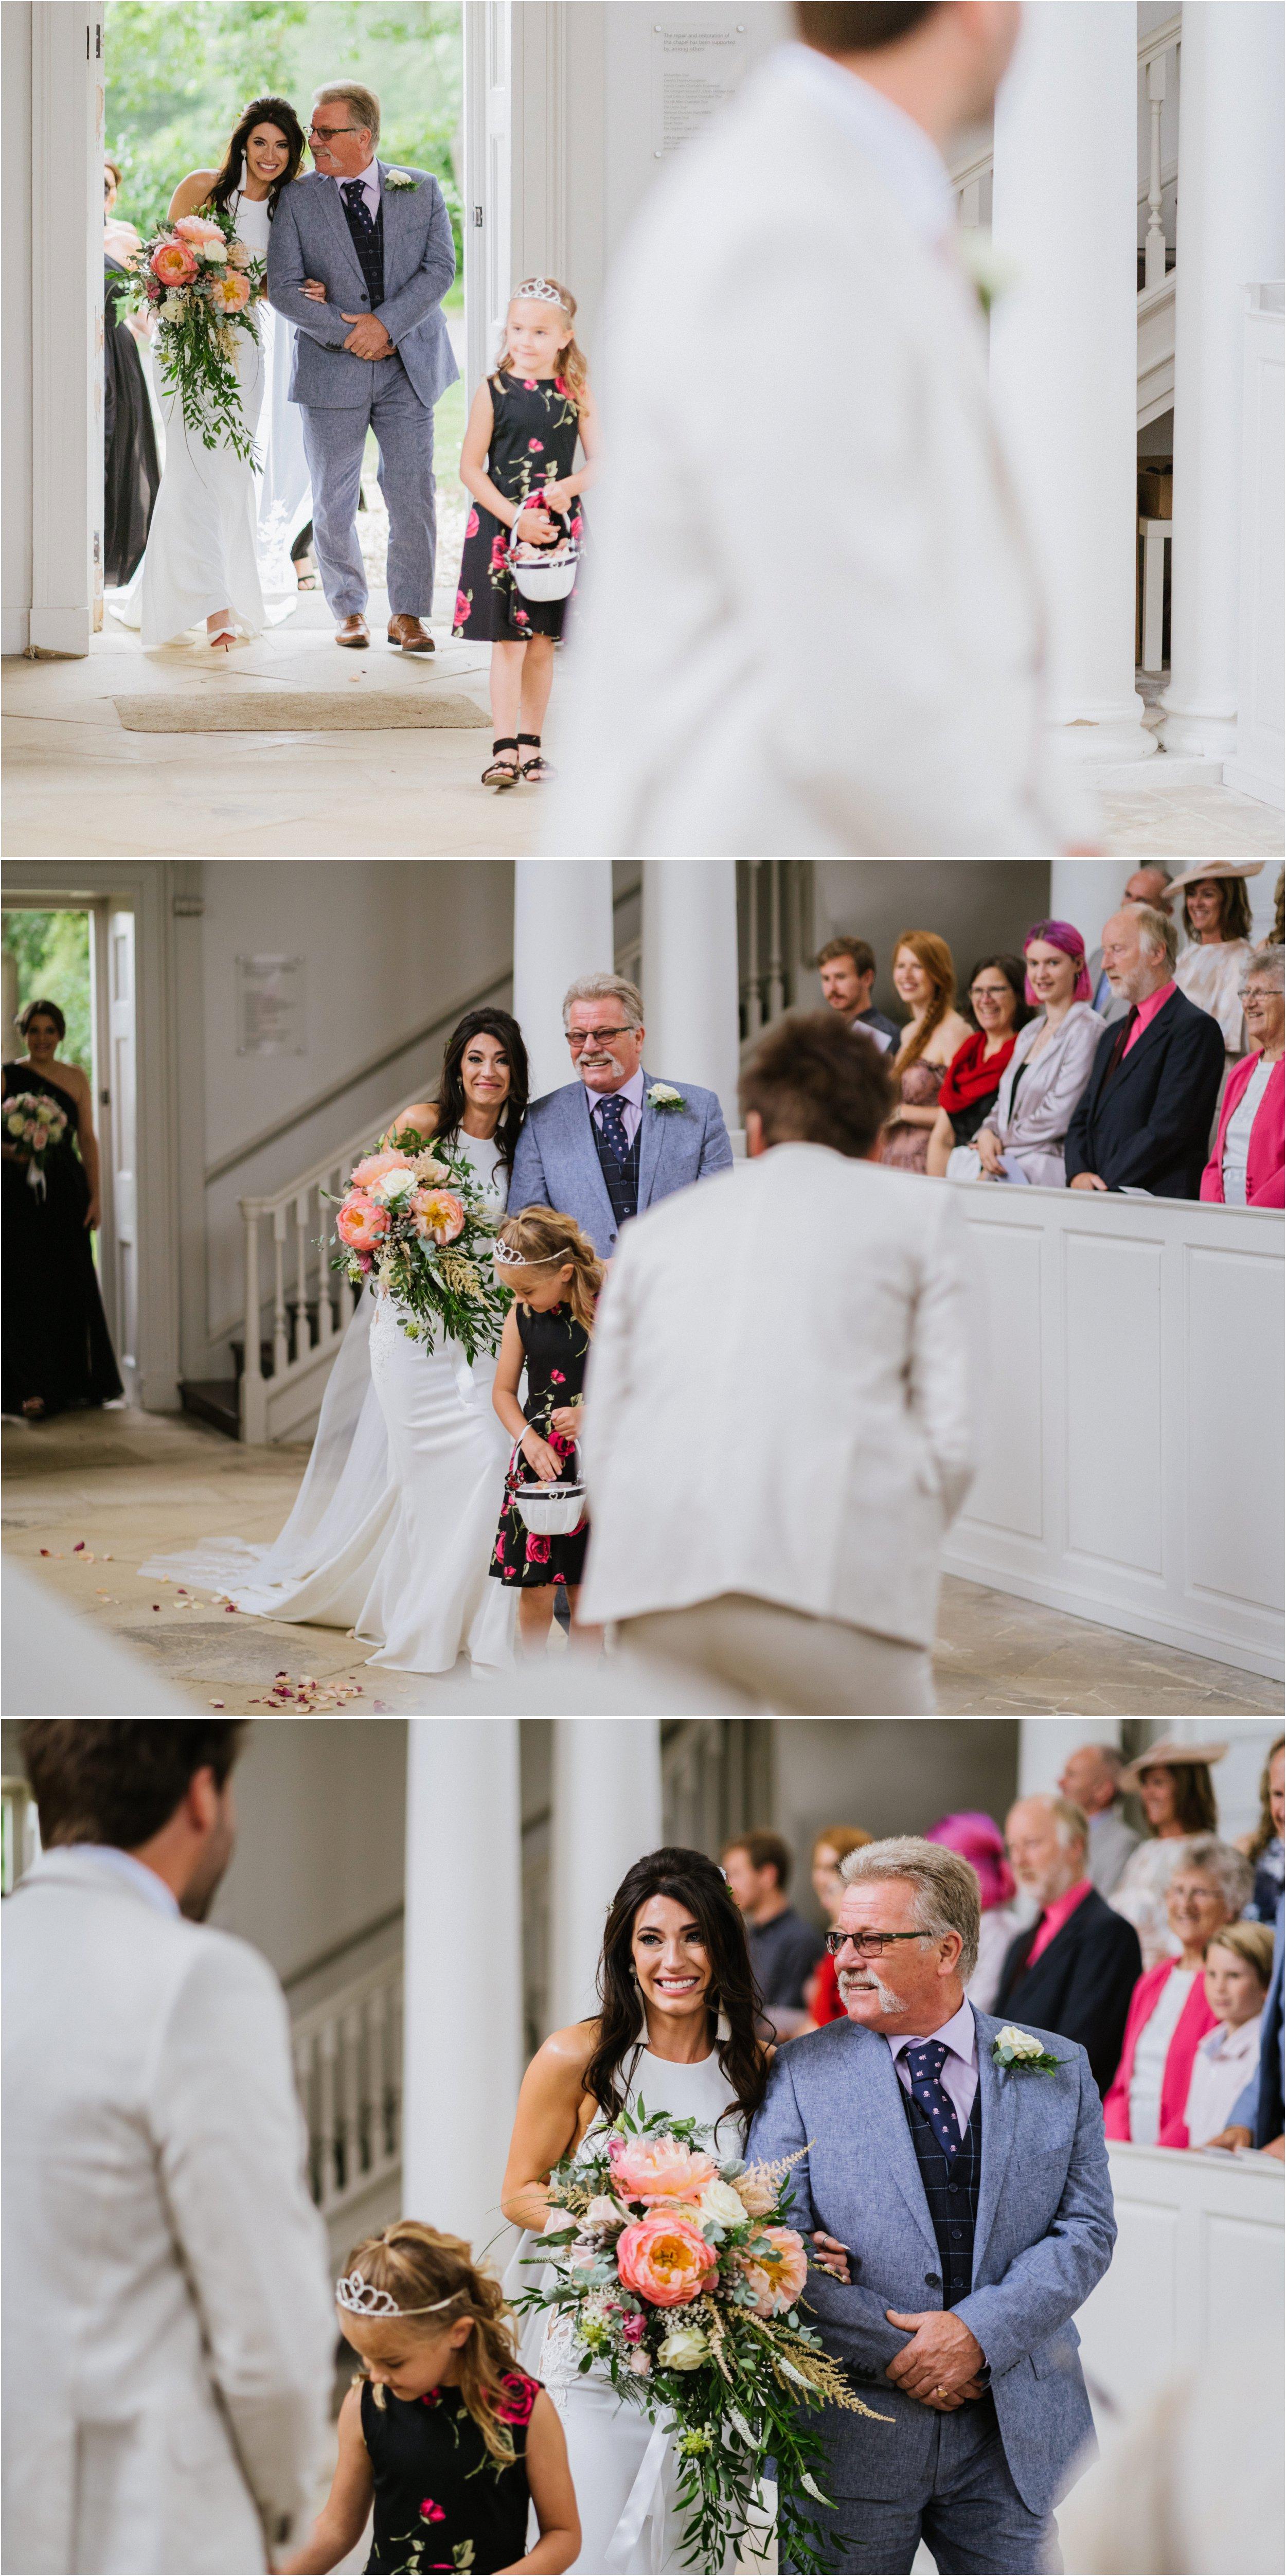 Compton Verney wedding photography_0053.jpg